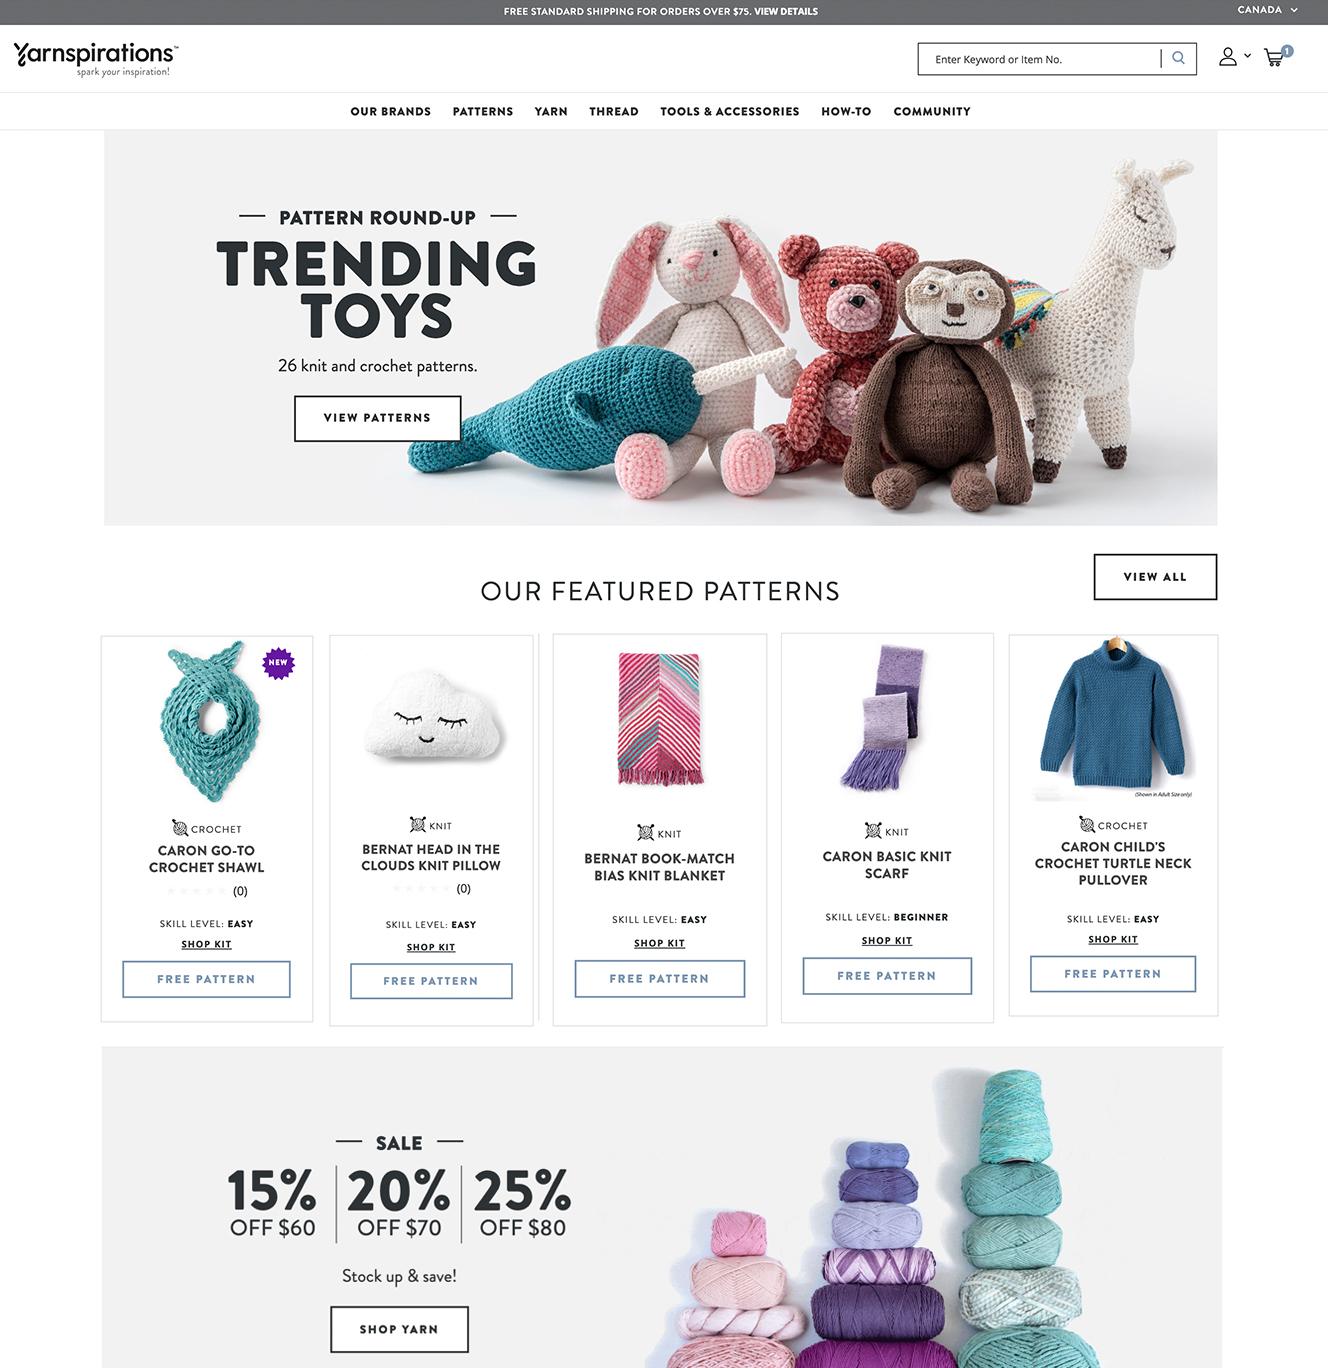 Yarnspirations.com Rebrand & Site Relaunch